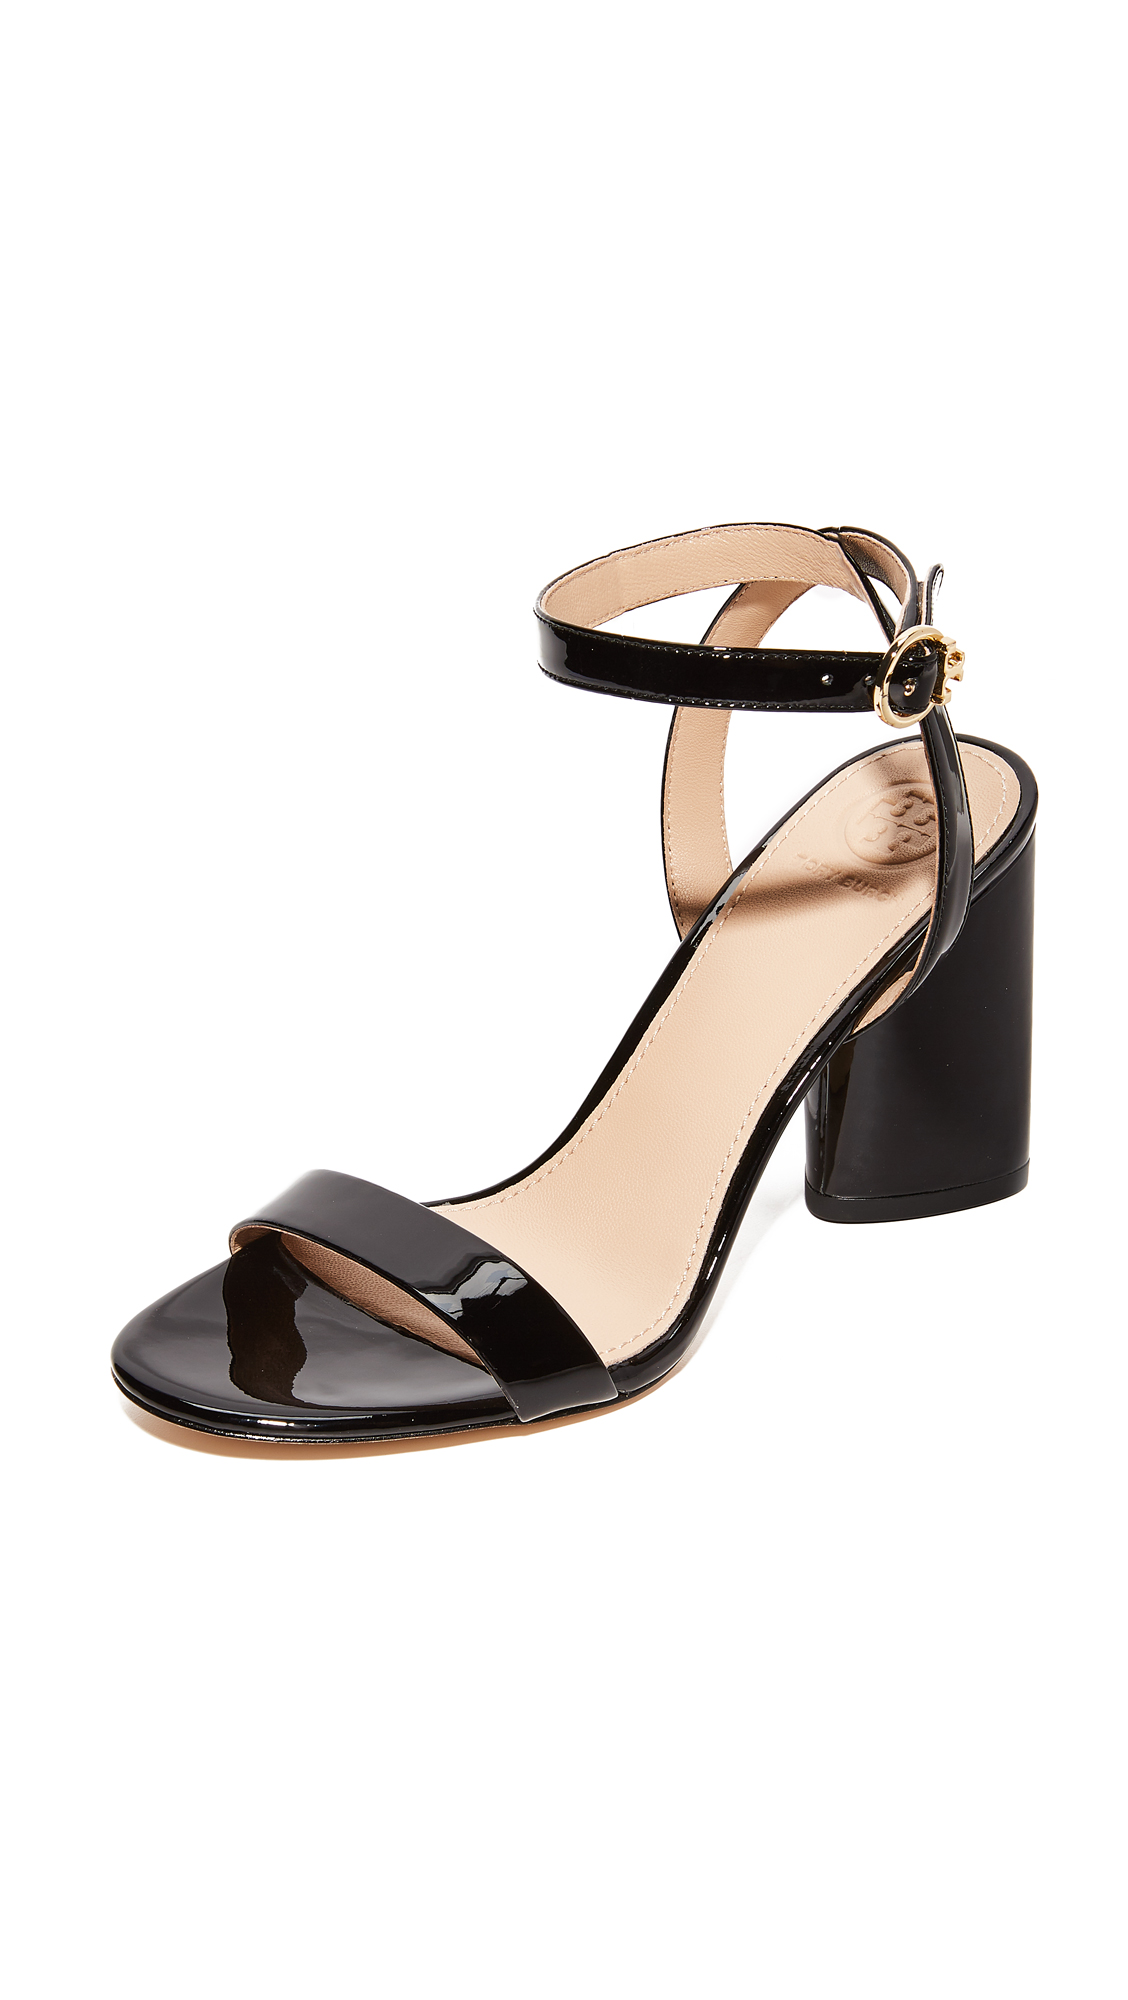 63d448512 Tory Burch Elizabeth 2 Sandals